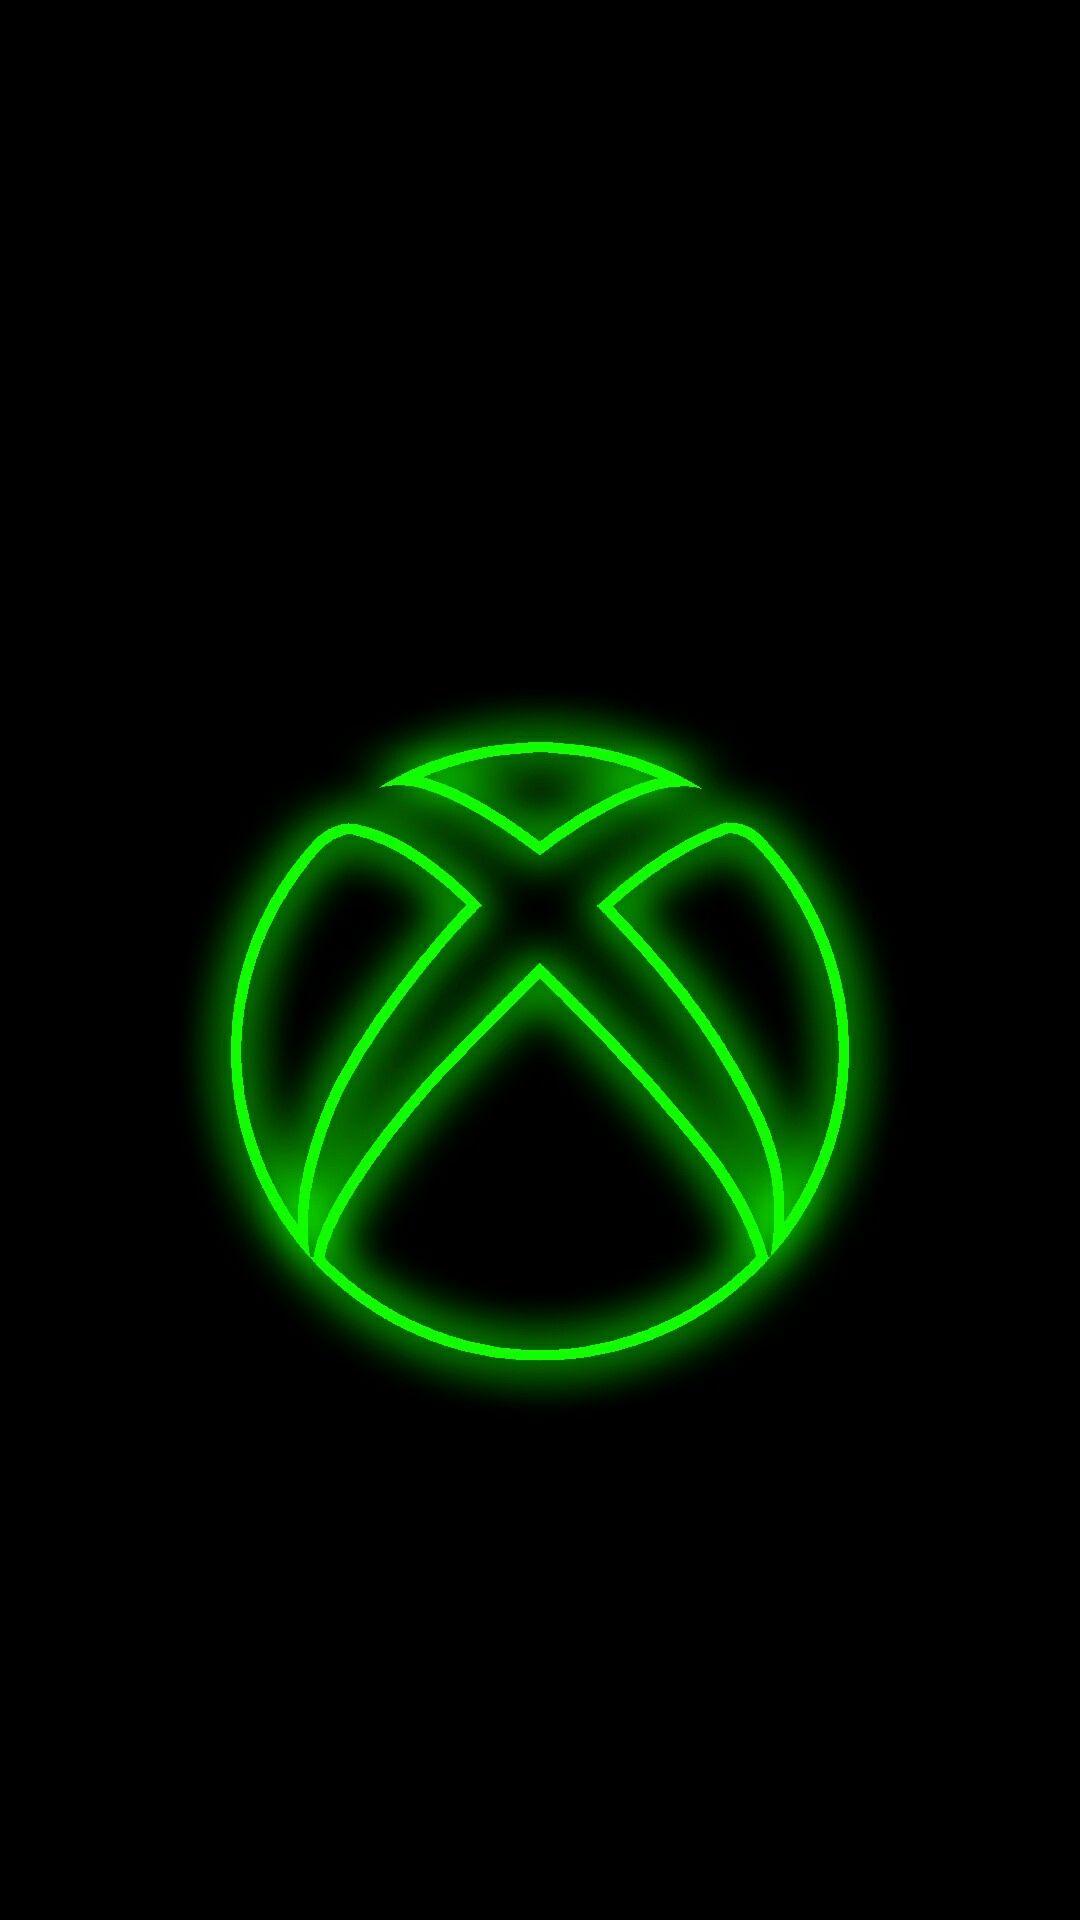 I Love The Neon Lights On My Favorite Logo Mejores Fondos De Pantalla De Videojuegos Fondo De Pantalla De Tecnologia Fonfo De Pantalla